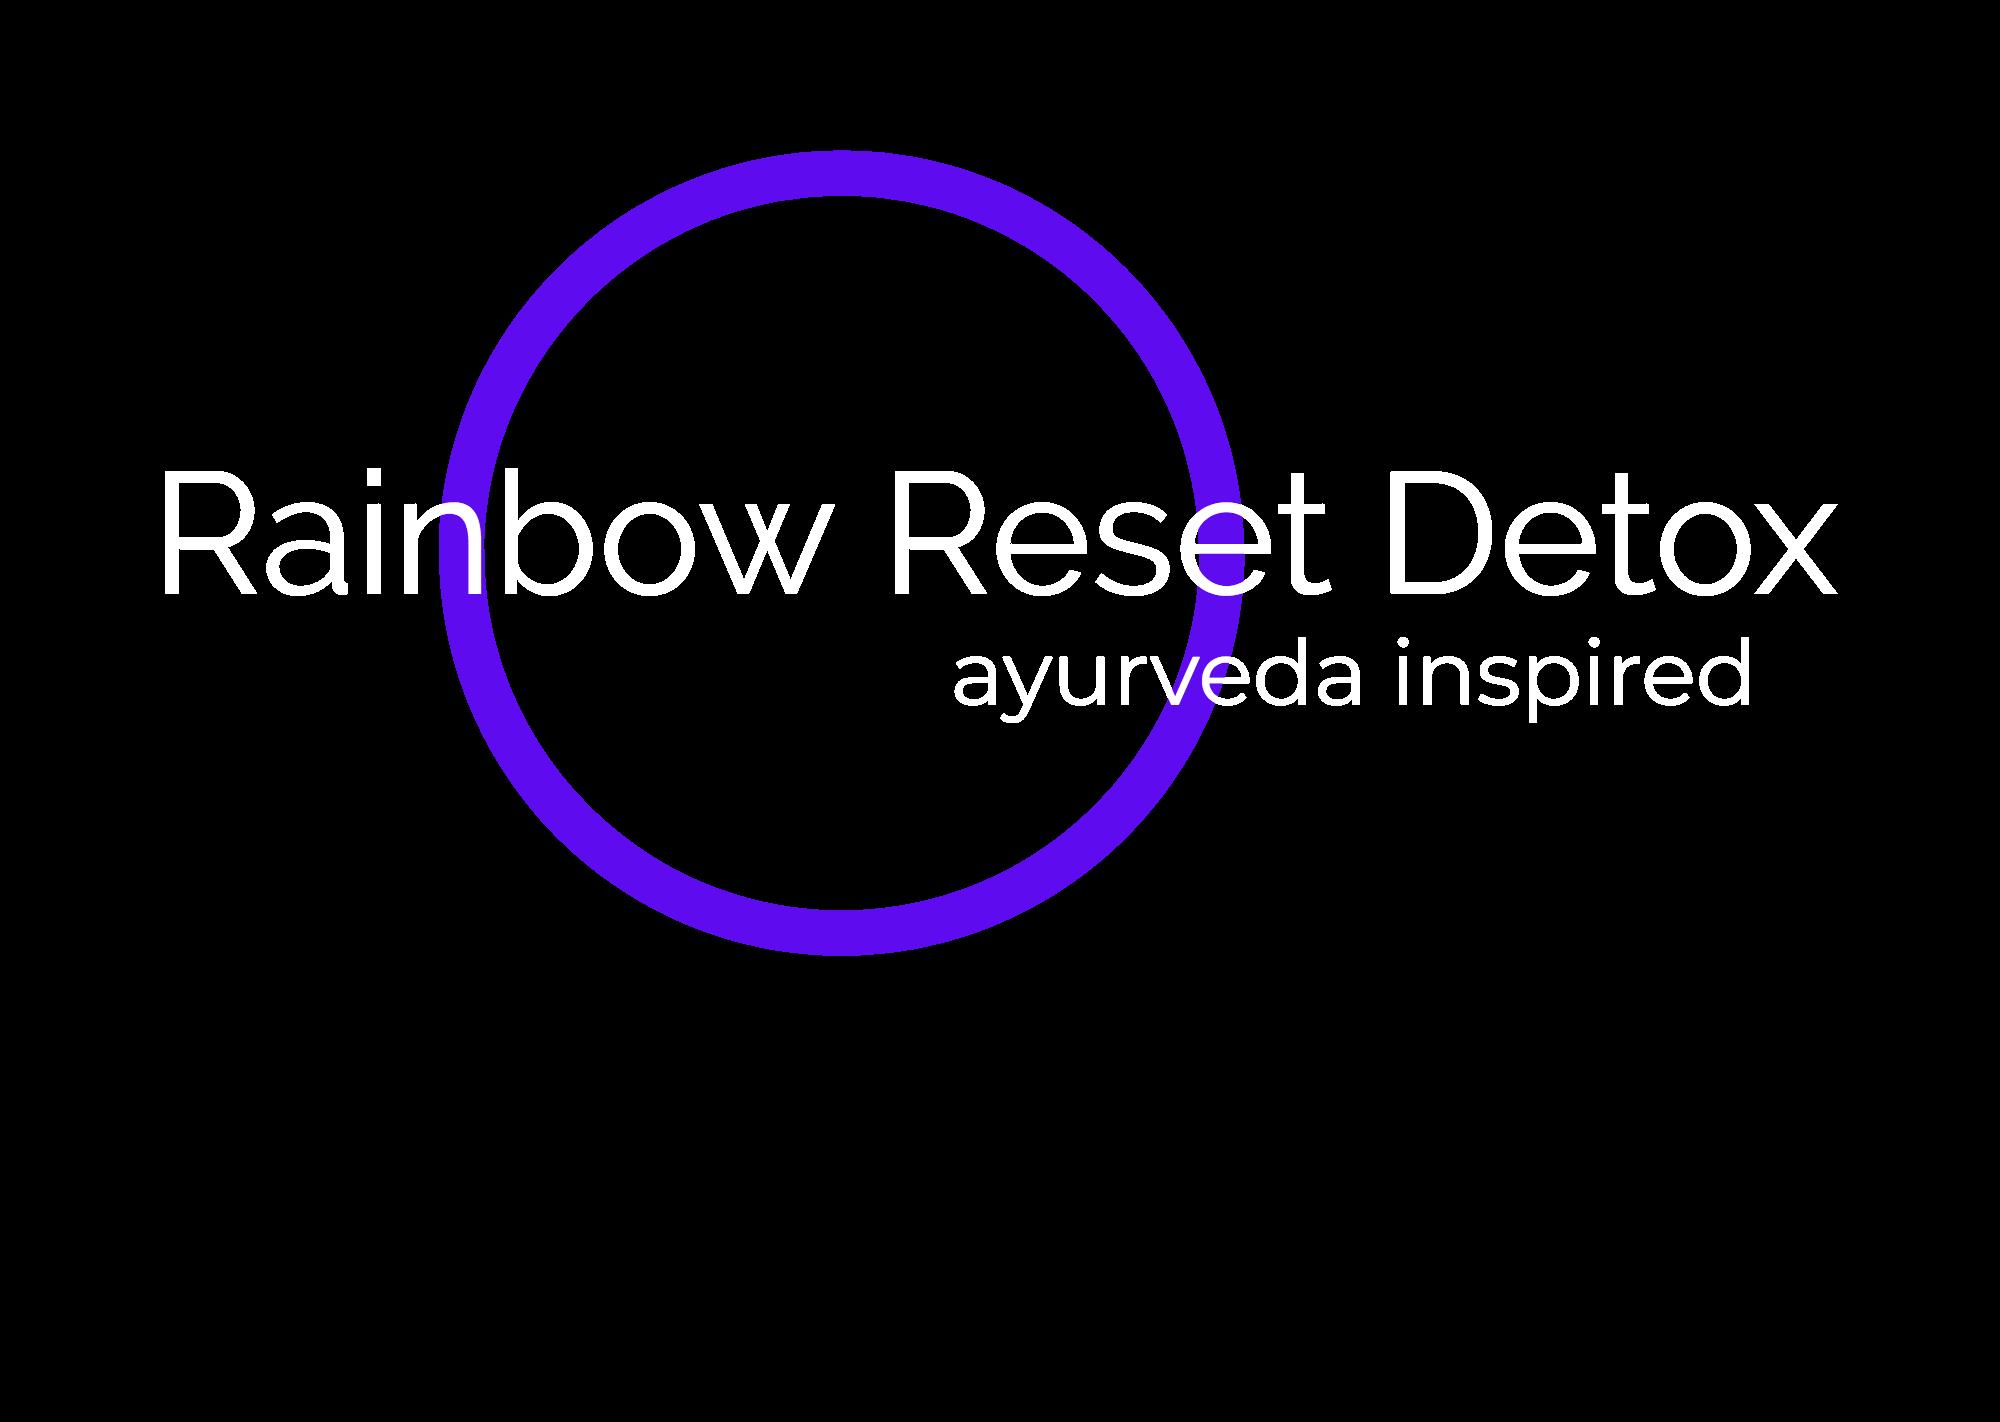 Rainbow Reset Detox-logo-1.png